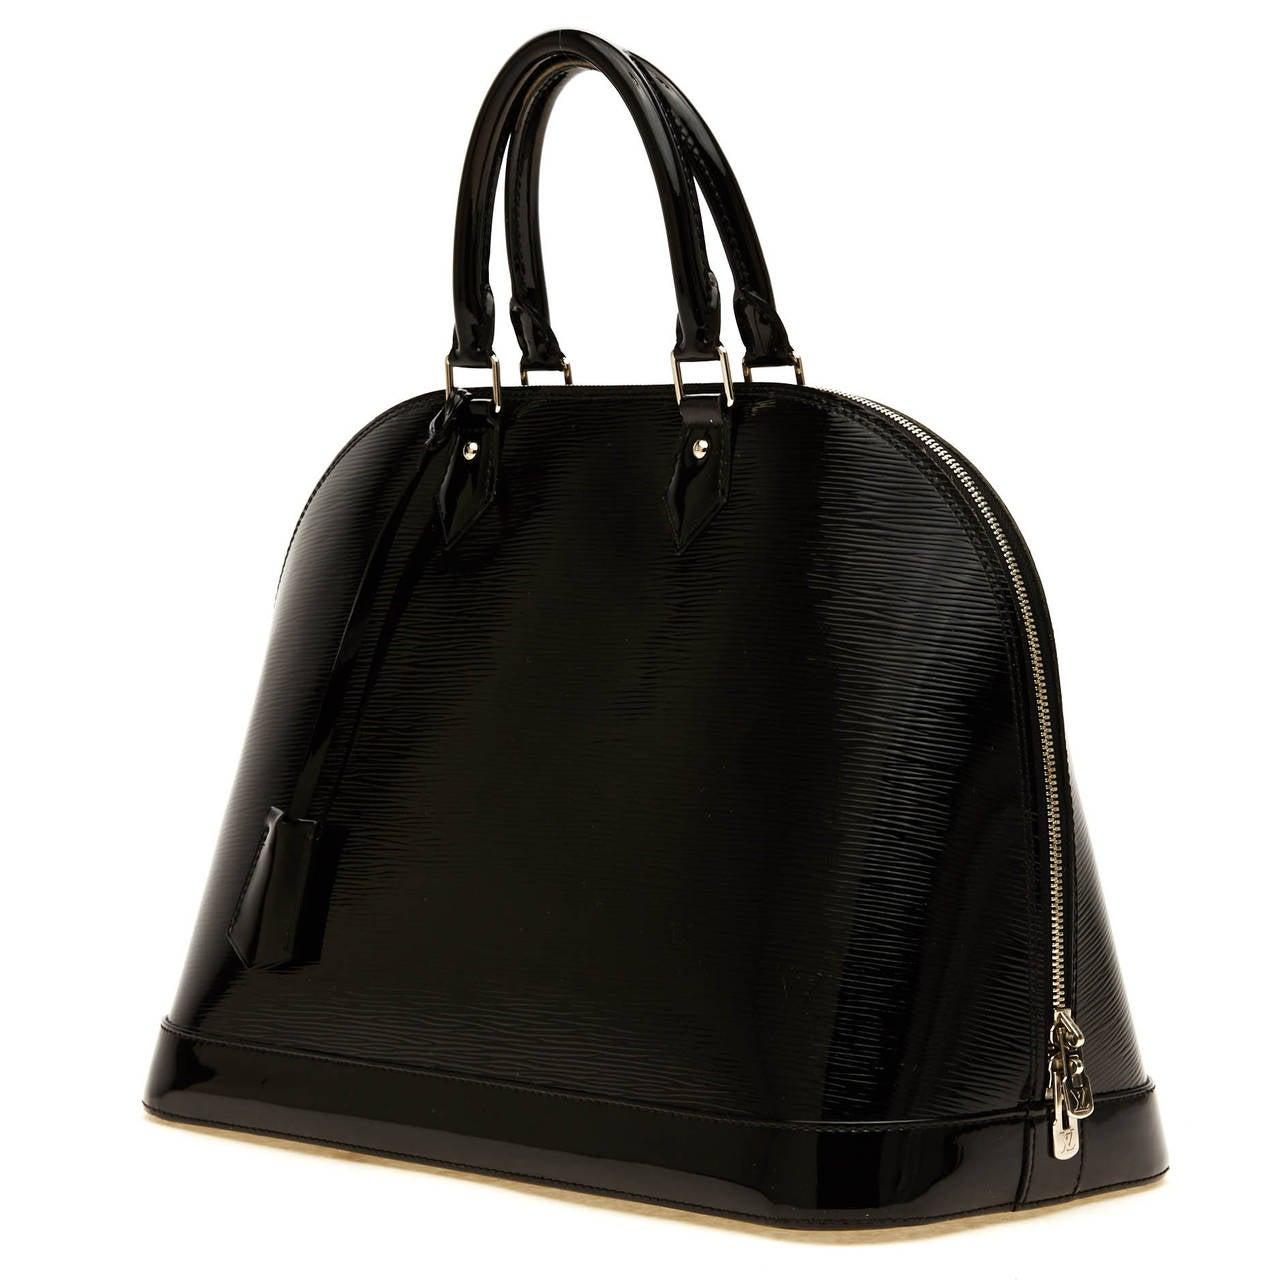 Image Result For Louis Vuitton Epi Electric Alma Pm Bag